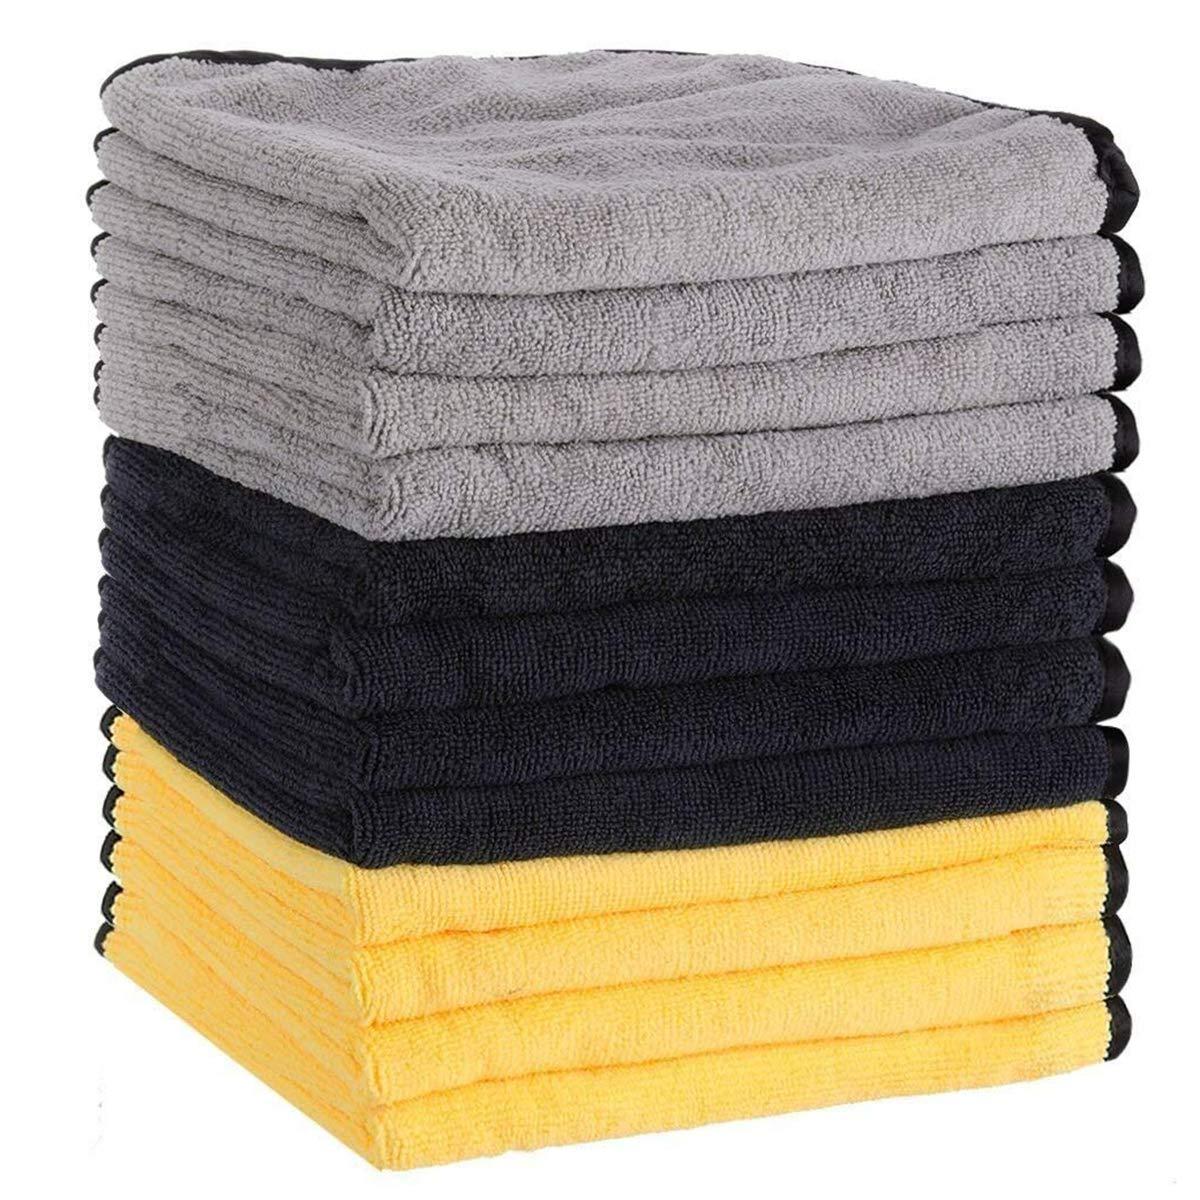 MATCC Microfibre Cleaning Cloths Pack of 12 Car Microfiber Cloth Lint Free Super Absorbent Car Microfibre Towel for Wash Waxing Polishing and Drying Detailing Towel(16'' x 16'') MATCCwoitxol219